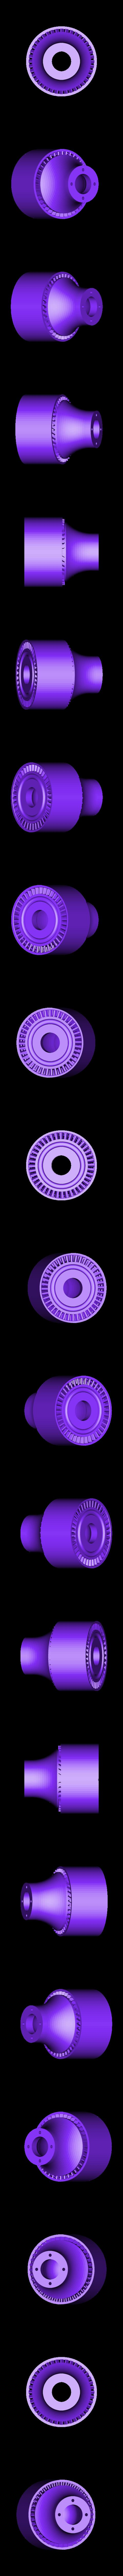 HPC-Rotor101ws.stl Download free STL file Jet Engine, 3-Spool • 3D printable object, konchan77